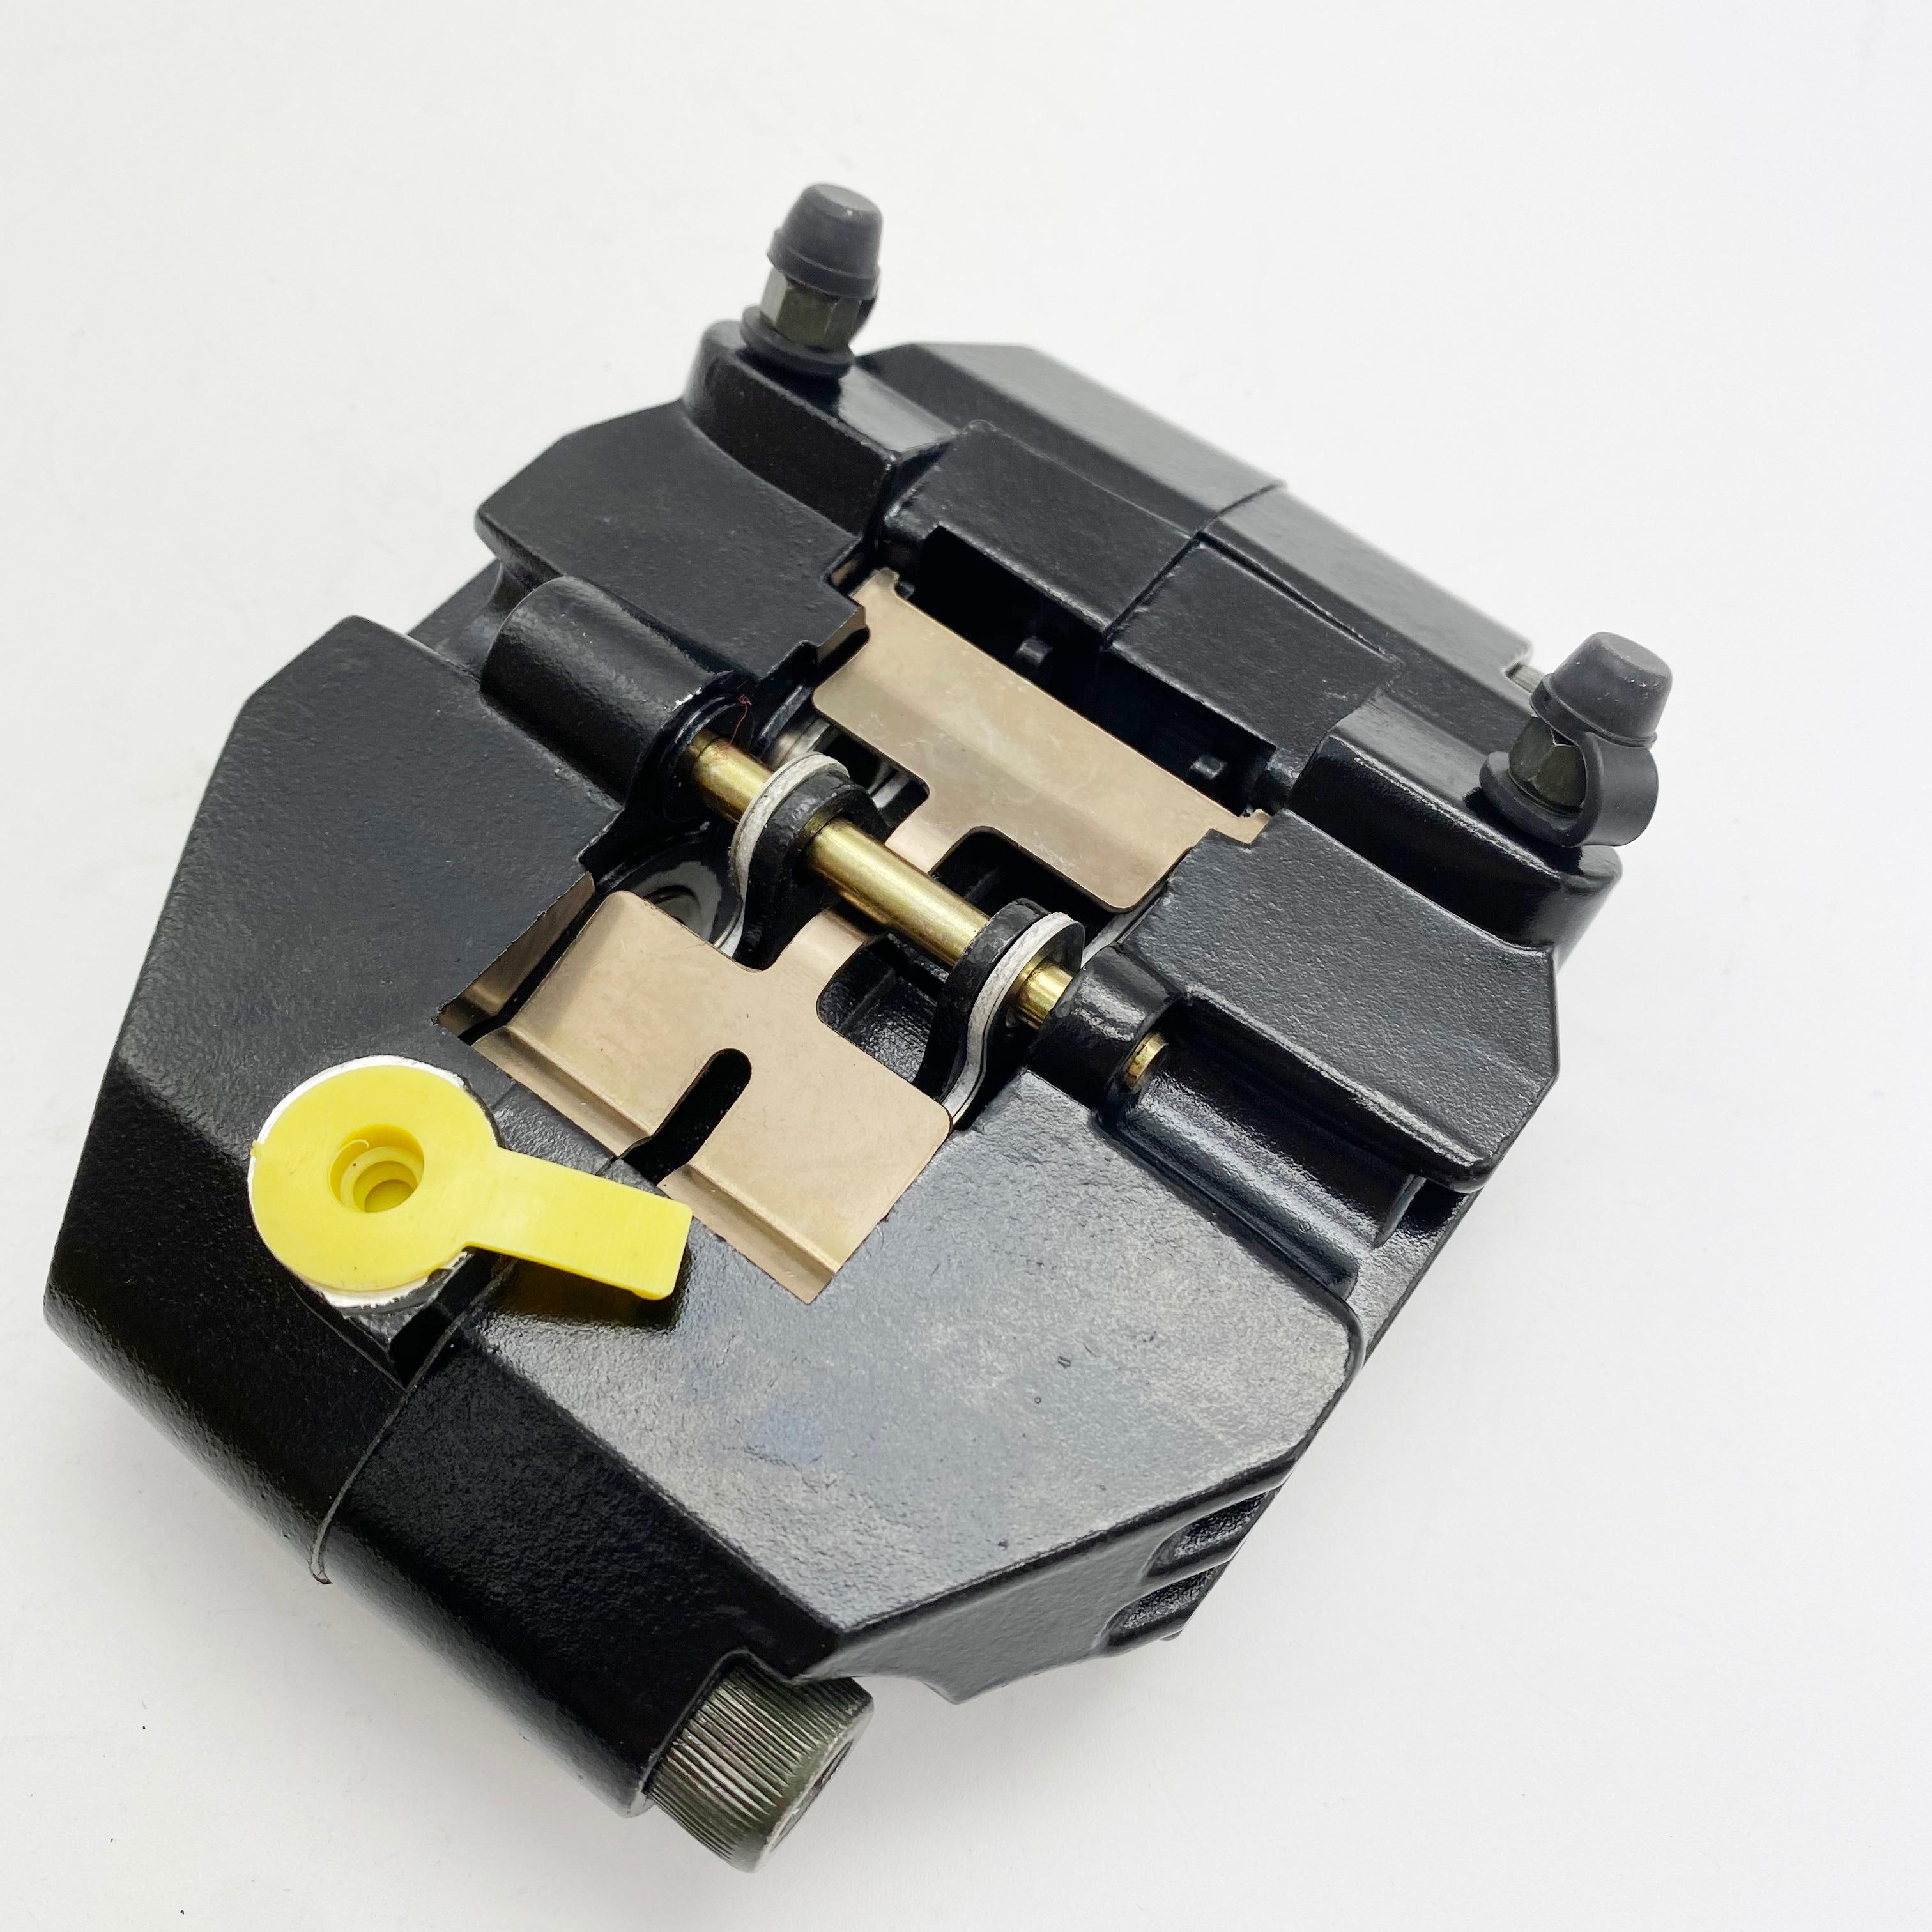 NEW REAR MIDDLE BRAKE ASSY EPA For OEM Hisun HS700 ATV 700CC 44700-107-0000 enlarge